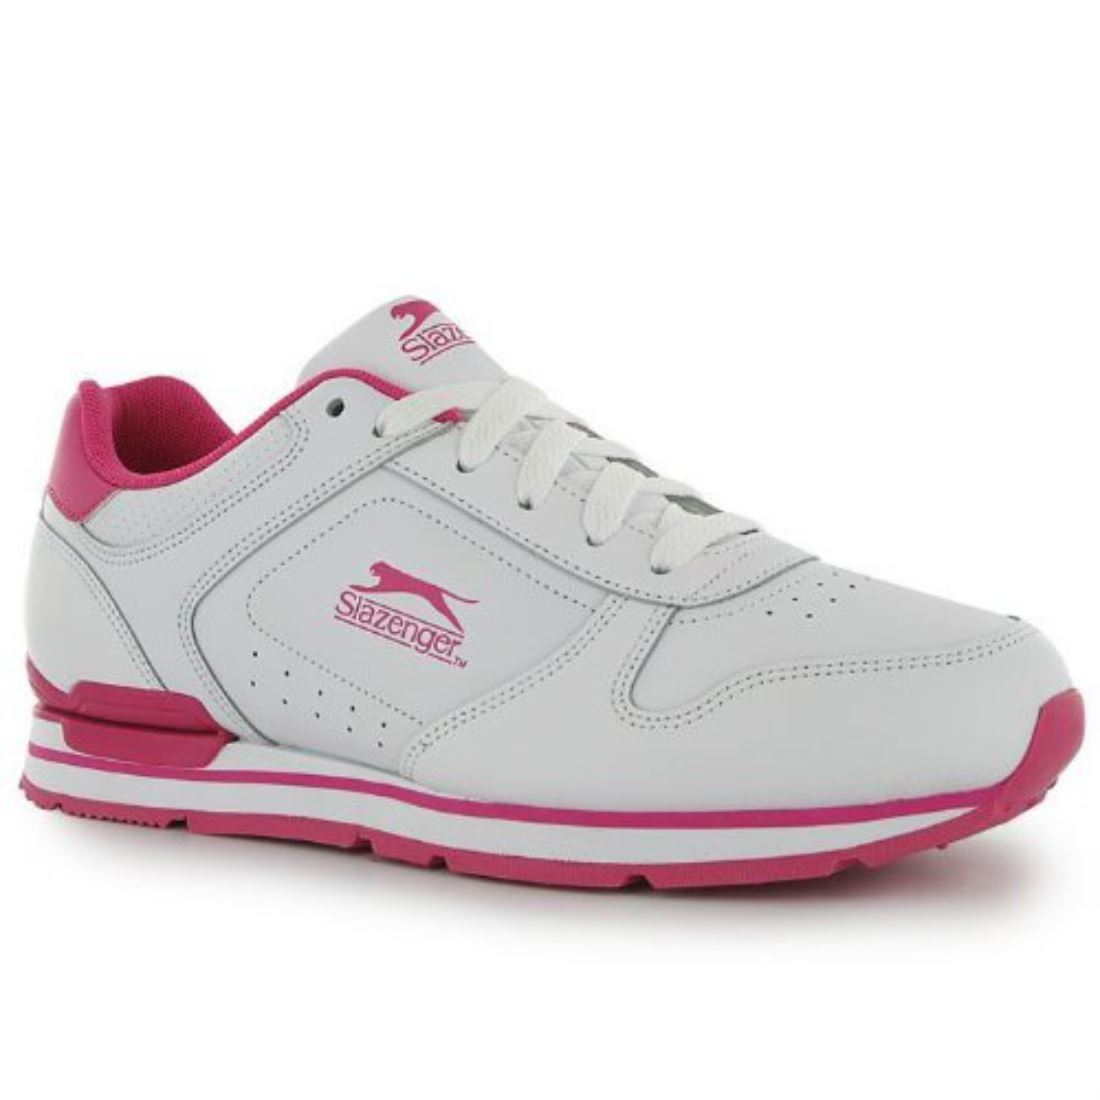 36e8fd015e Slazenger Classic Womens Ladies Trainers Sports Everyday Casual ...